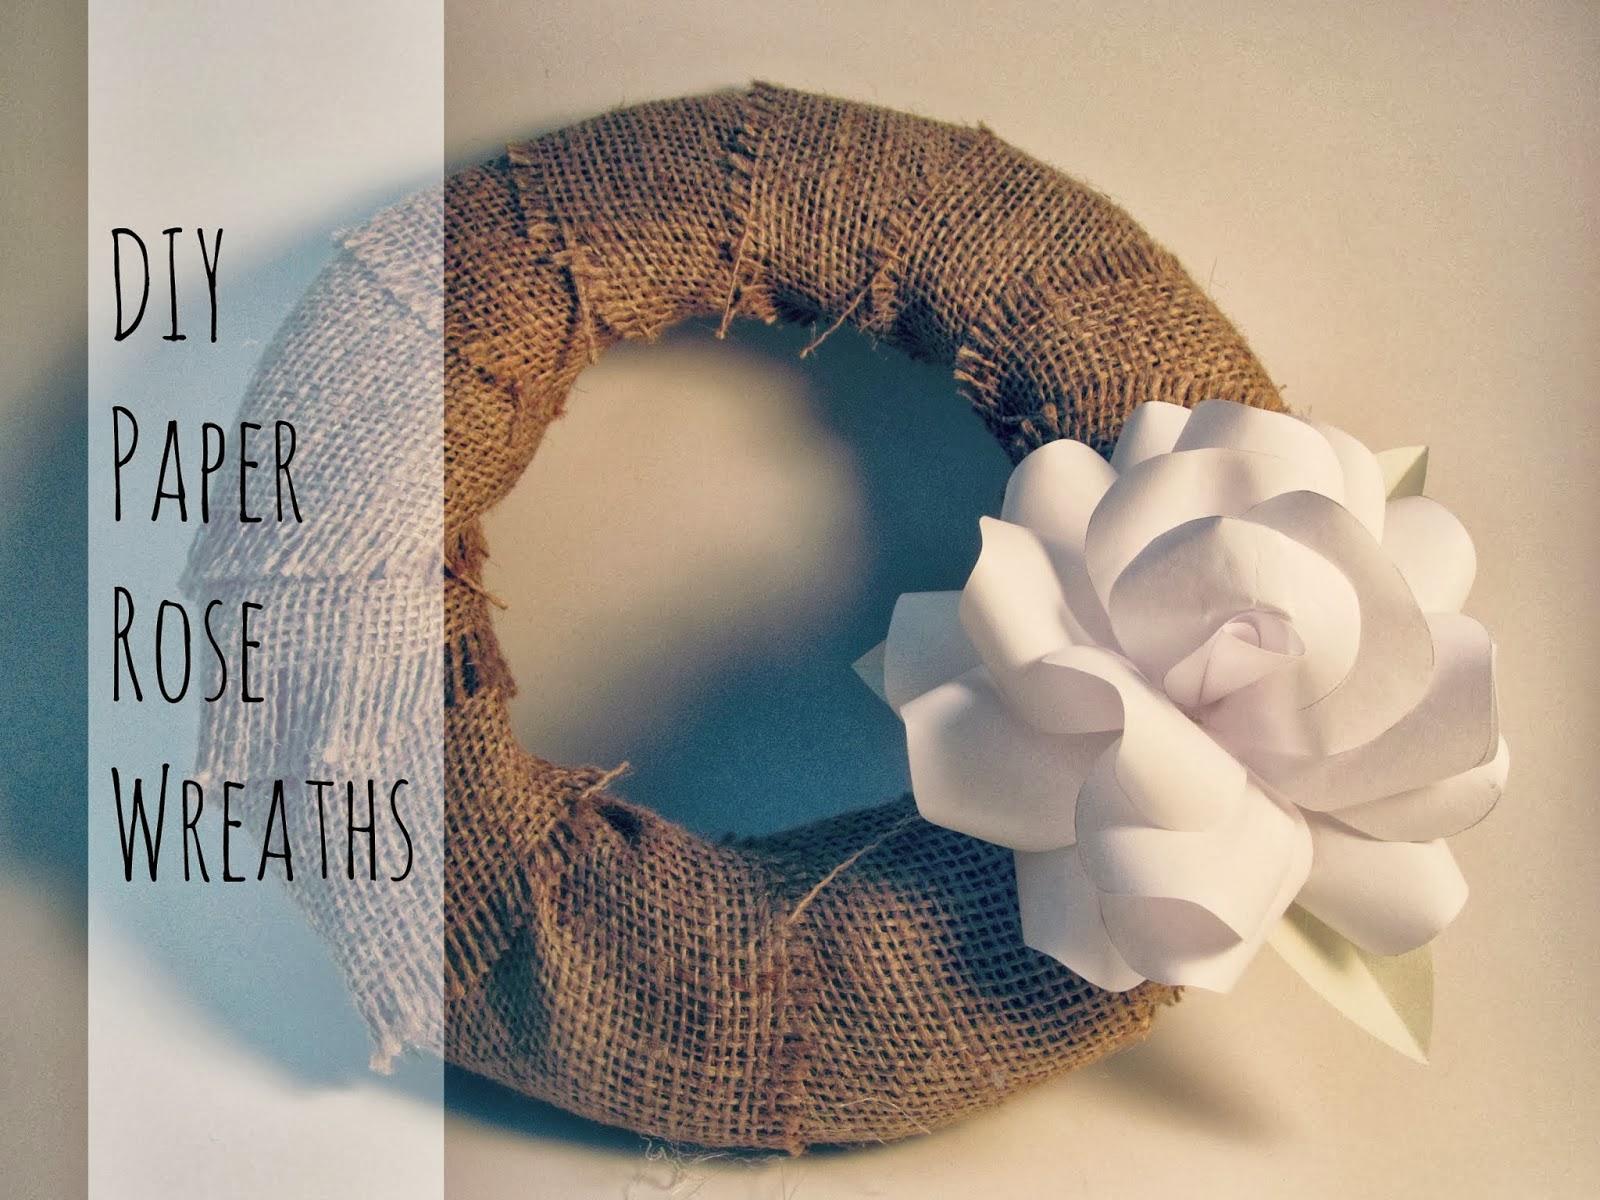 http://elcrumbo.blogspot.com/2014/01/diy-paper-rose-wreaths.html